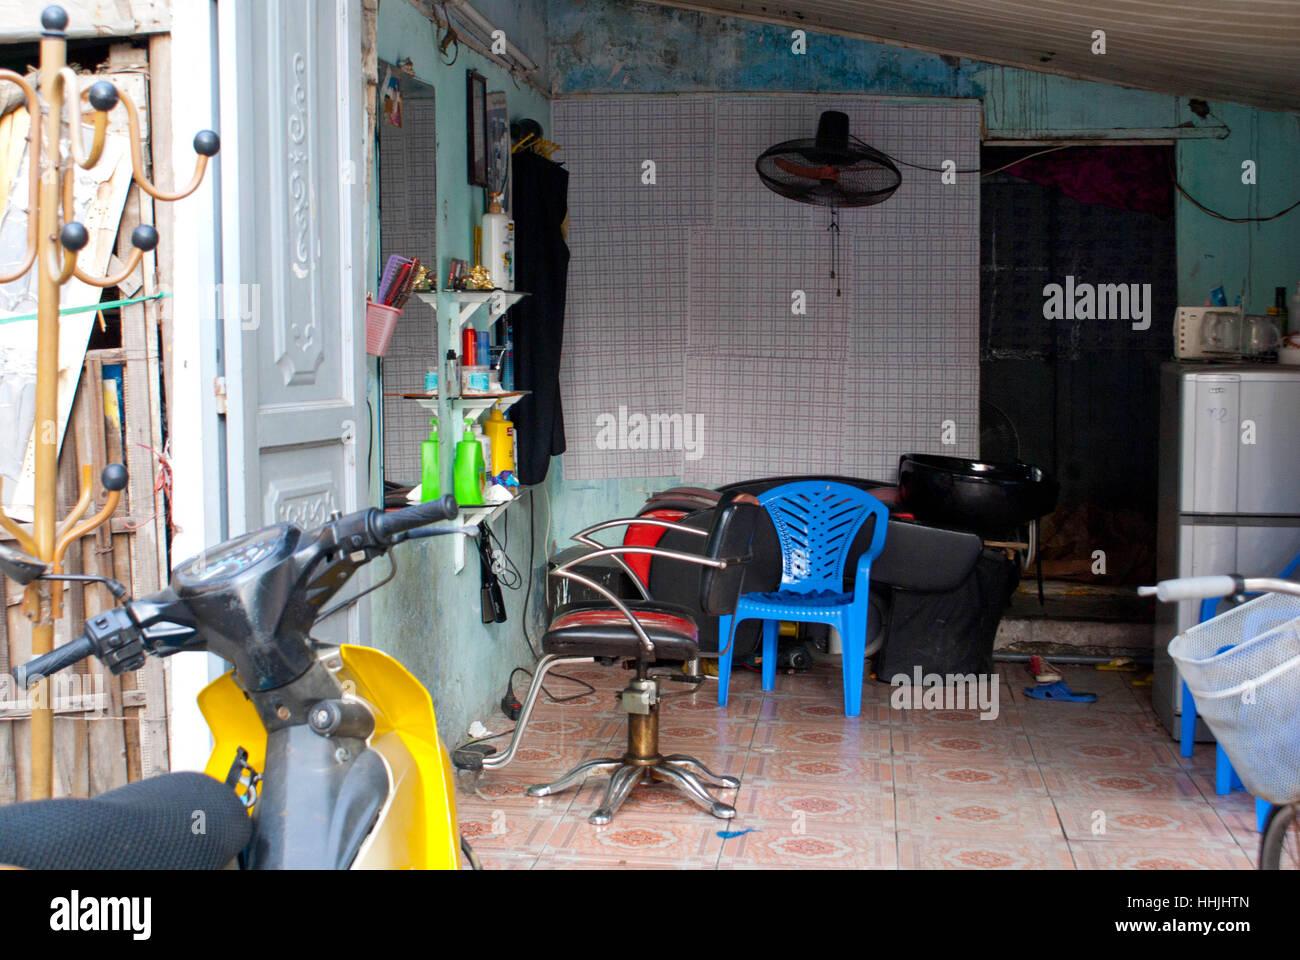 Hairdressing salon, Saigon, Vietnam - Stock Image